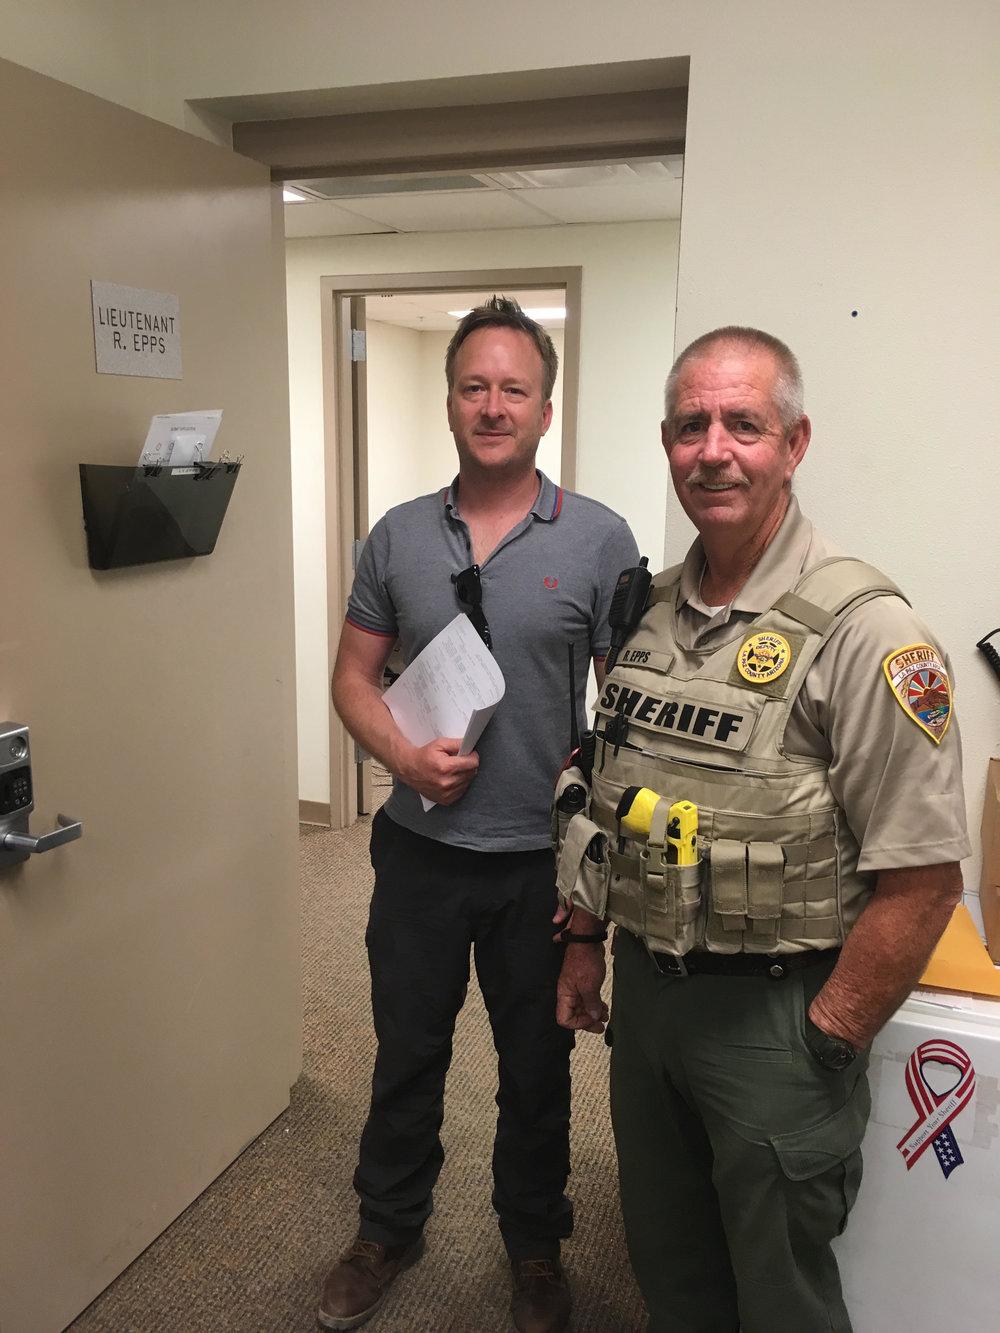 Alex Hannaford interviews a sheriff's office lieutenant for an episode of Dead Man Talking